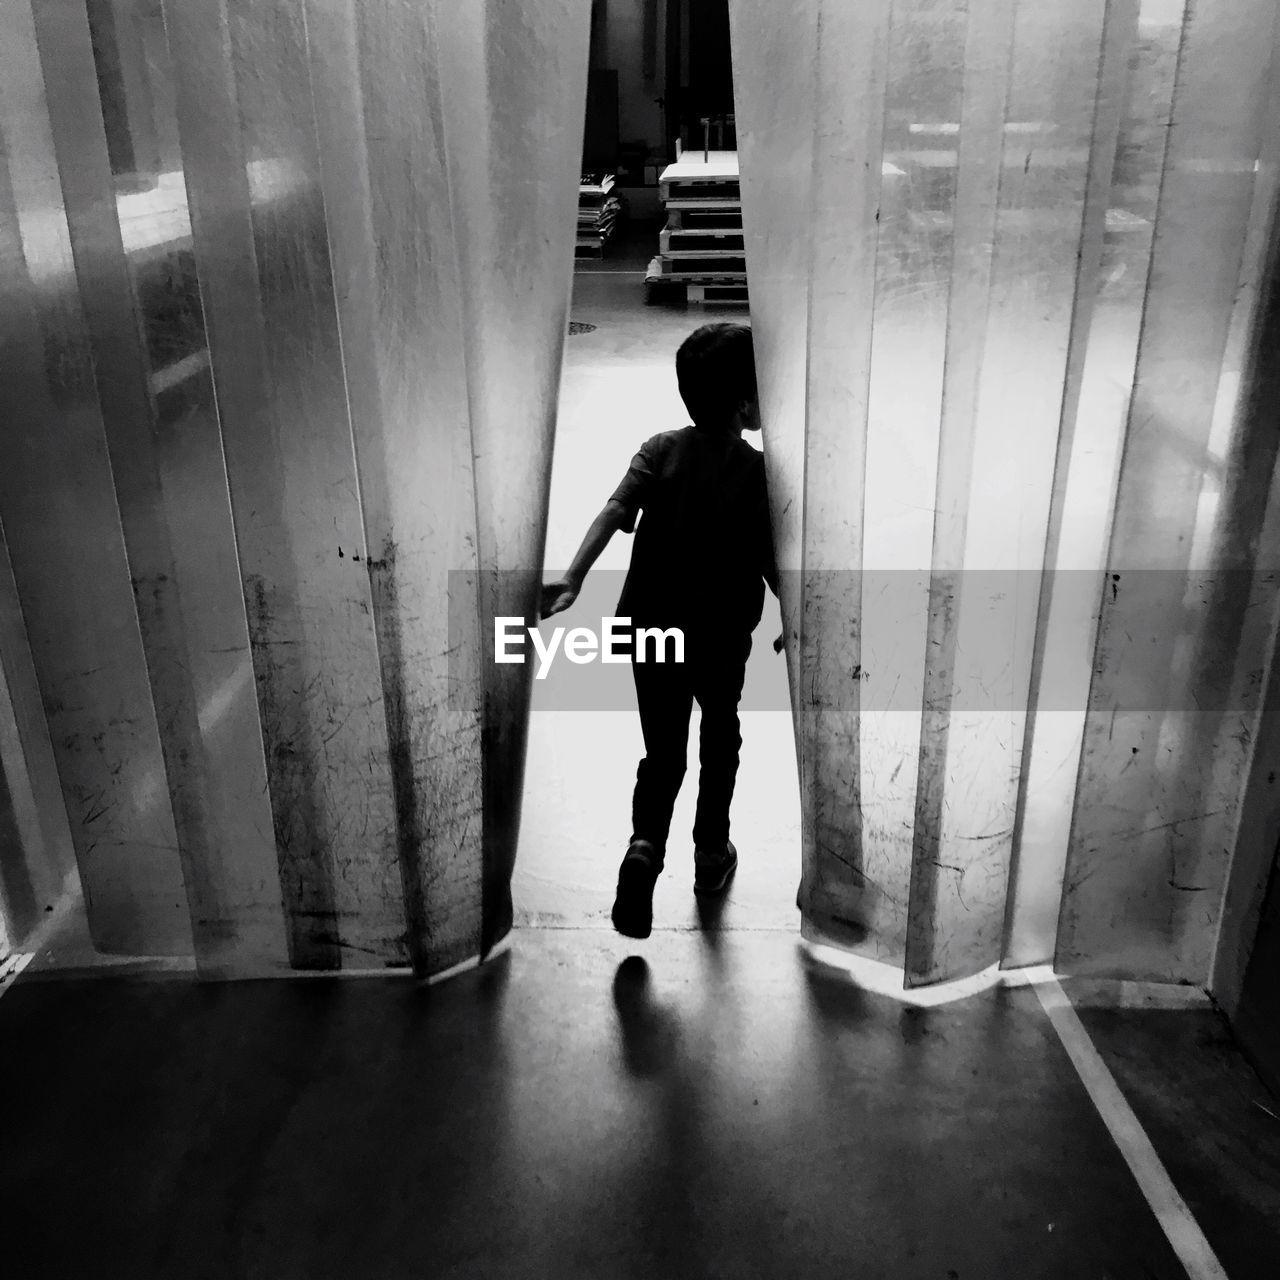 FULL LENGTH REAR VIEW OF MAN WALKING IN CORRIDOR